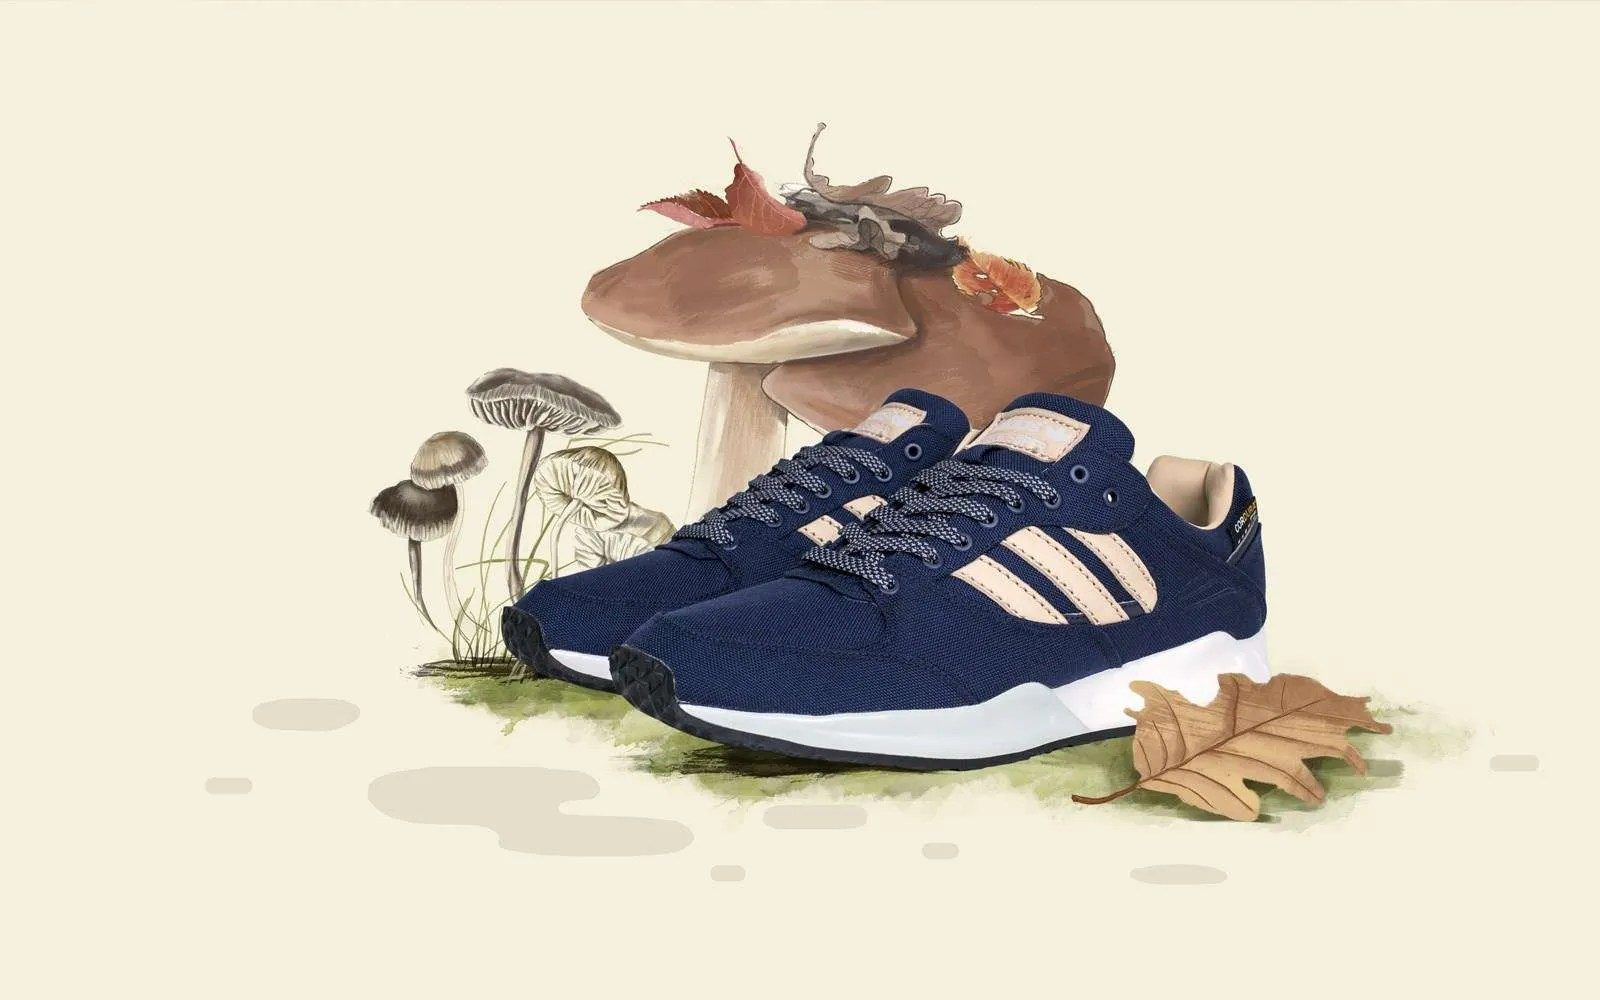 the latest 578fa 65fc6 Sneakersnstuff x adidas Originals Tech Super  Autumn Stories